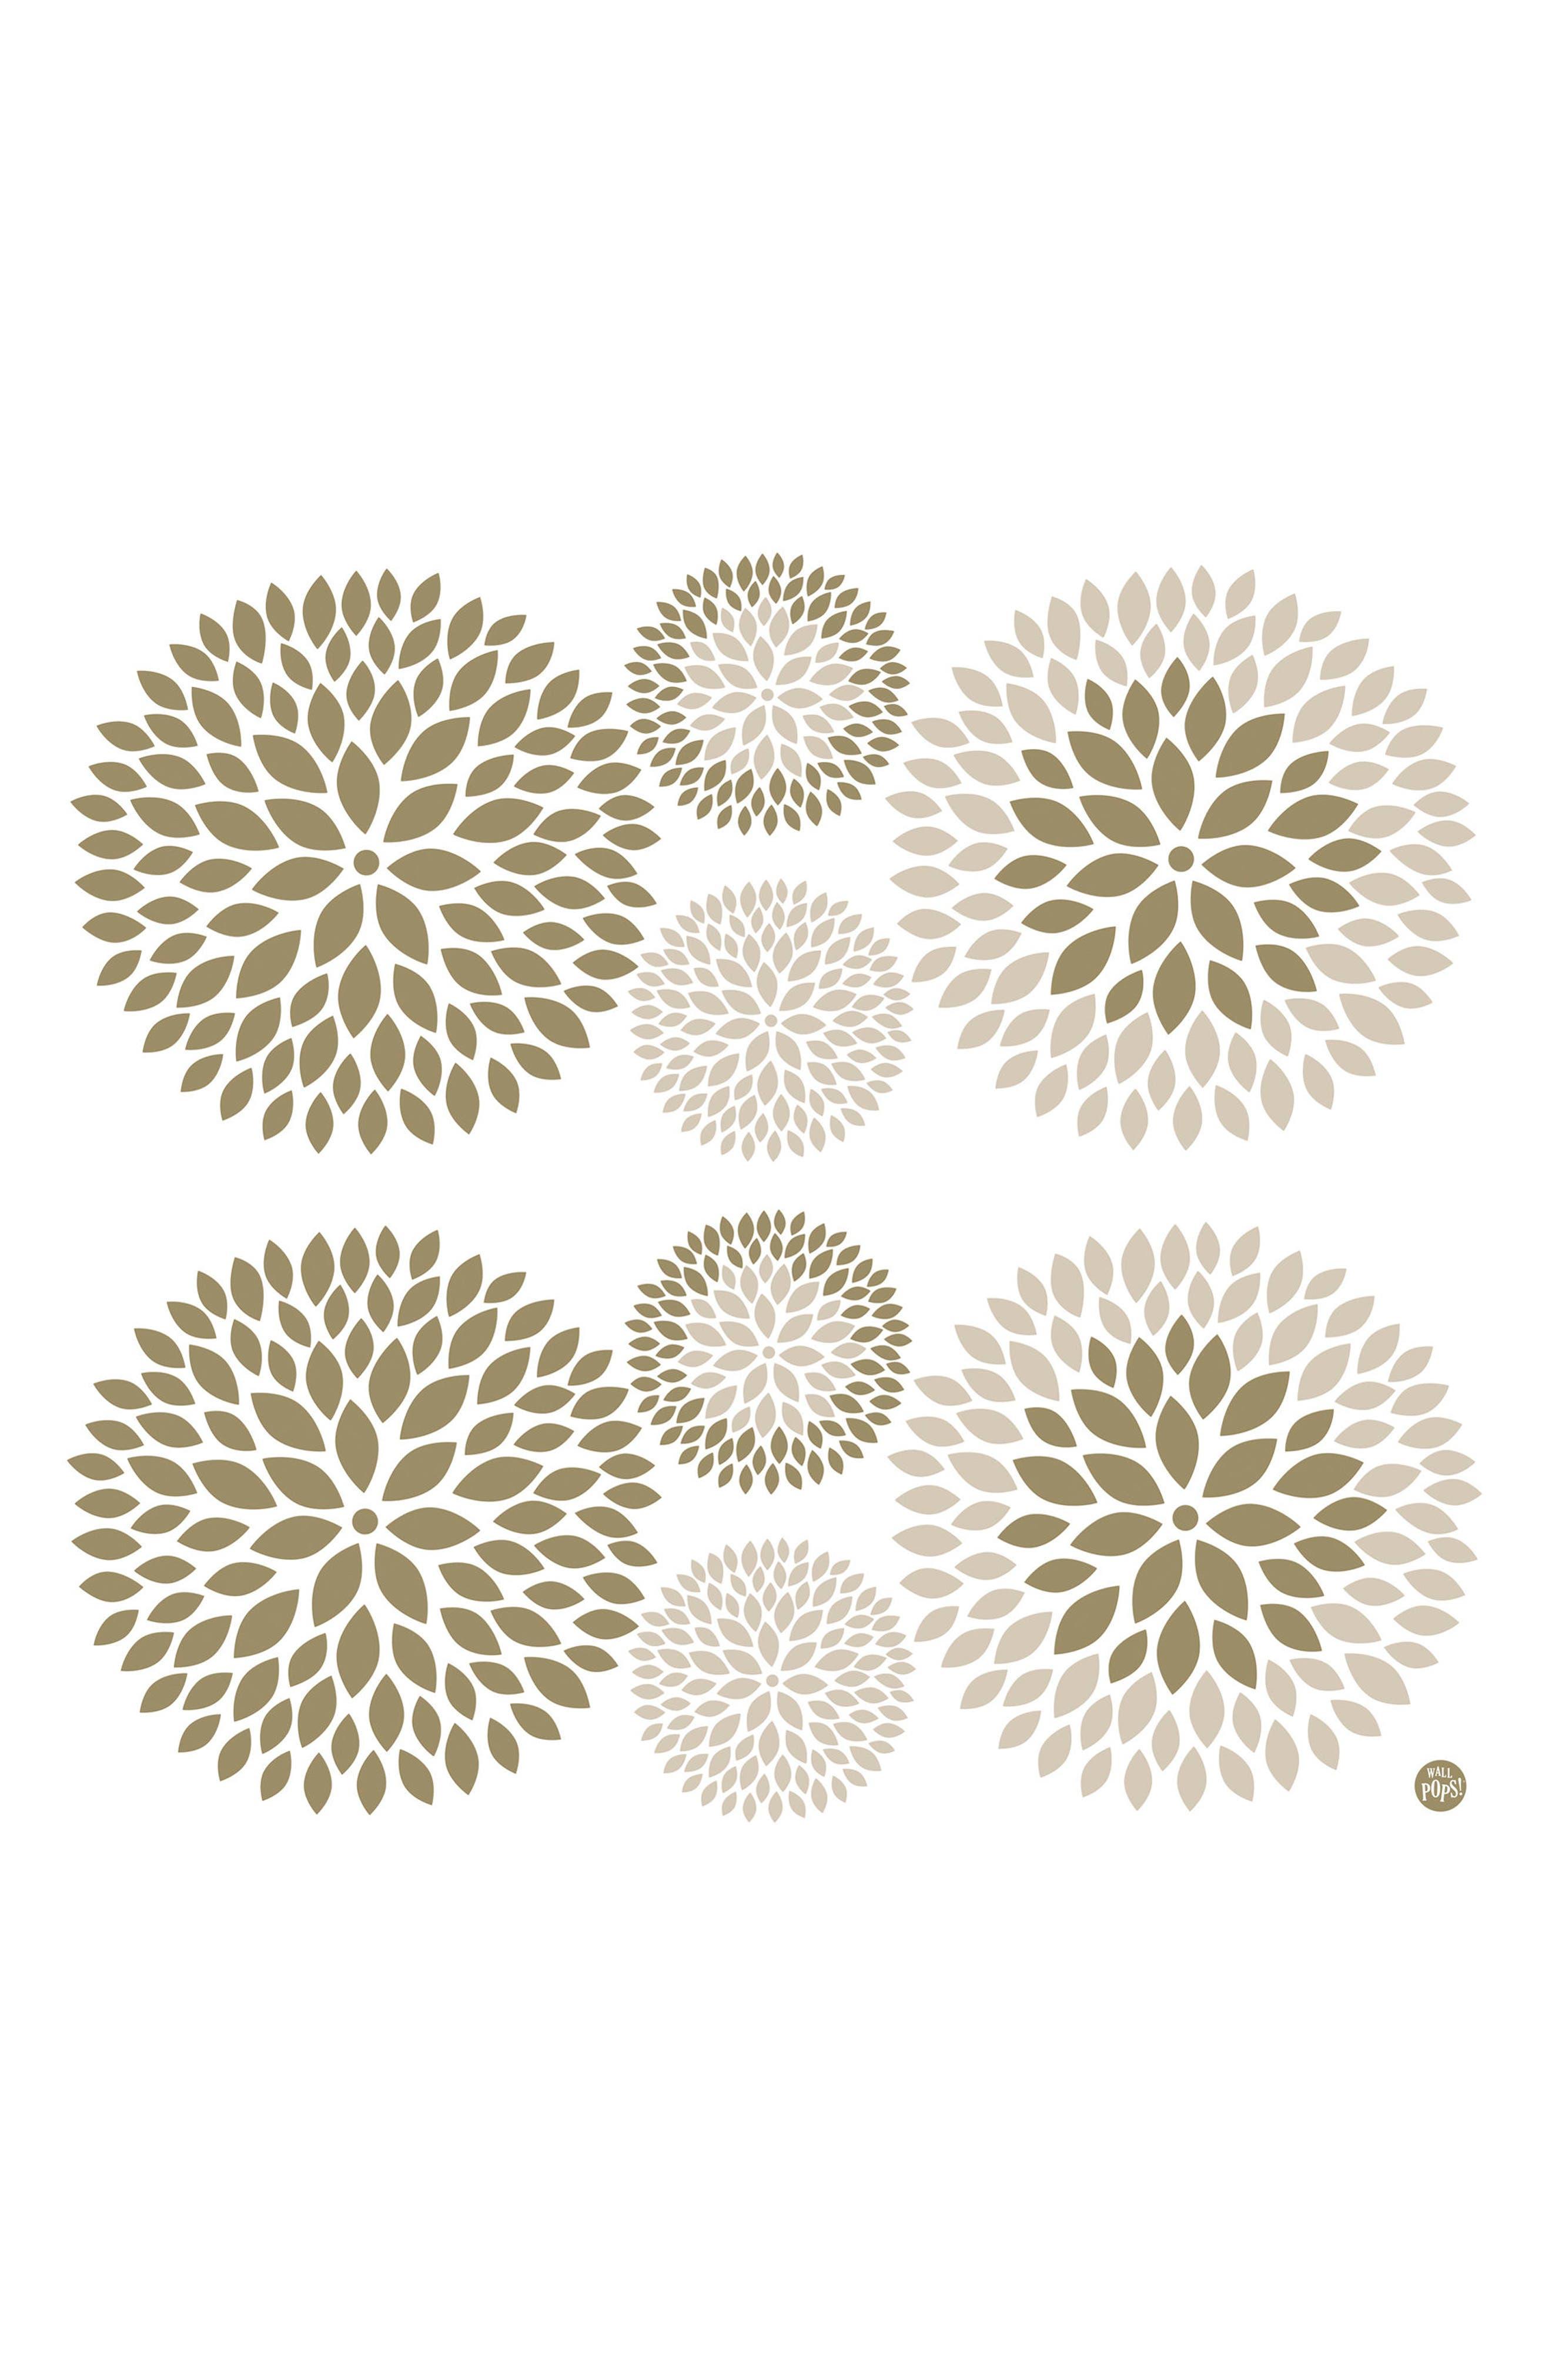 Chrysanthemum 8-Piece Wall Art Decal Set,                             Main thumbnail 1, color,                             250